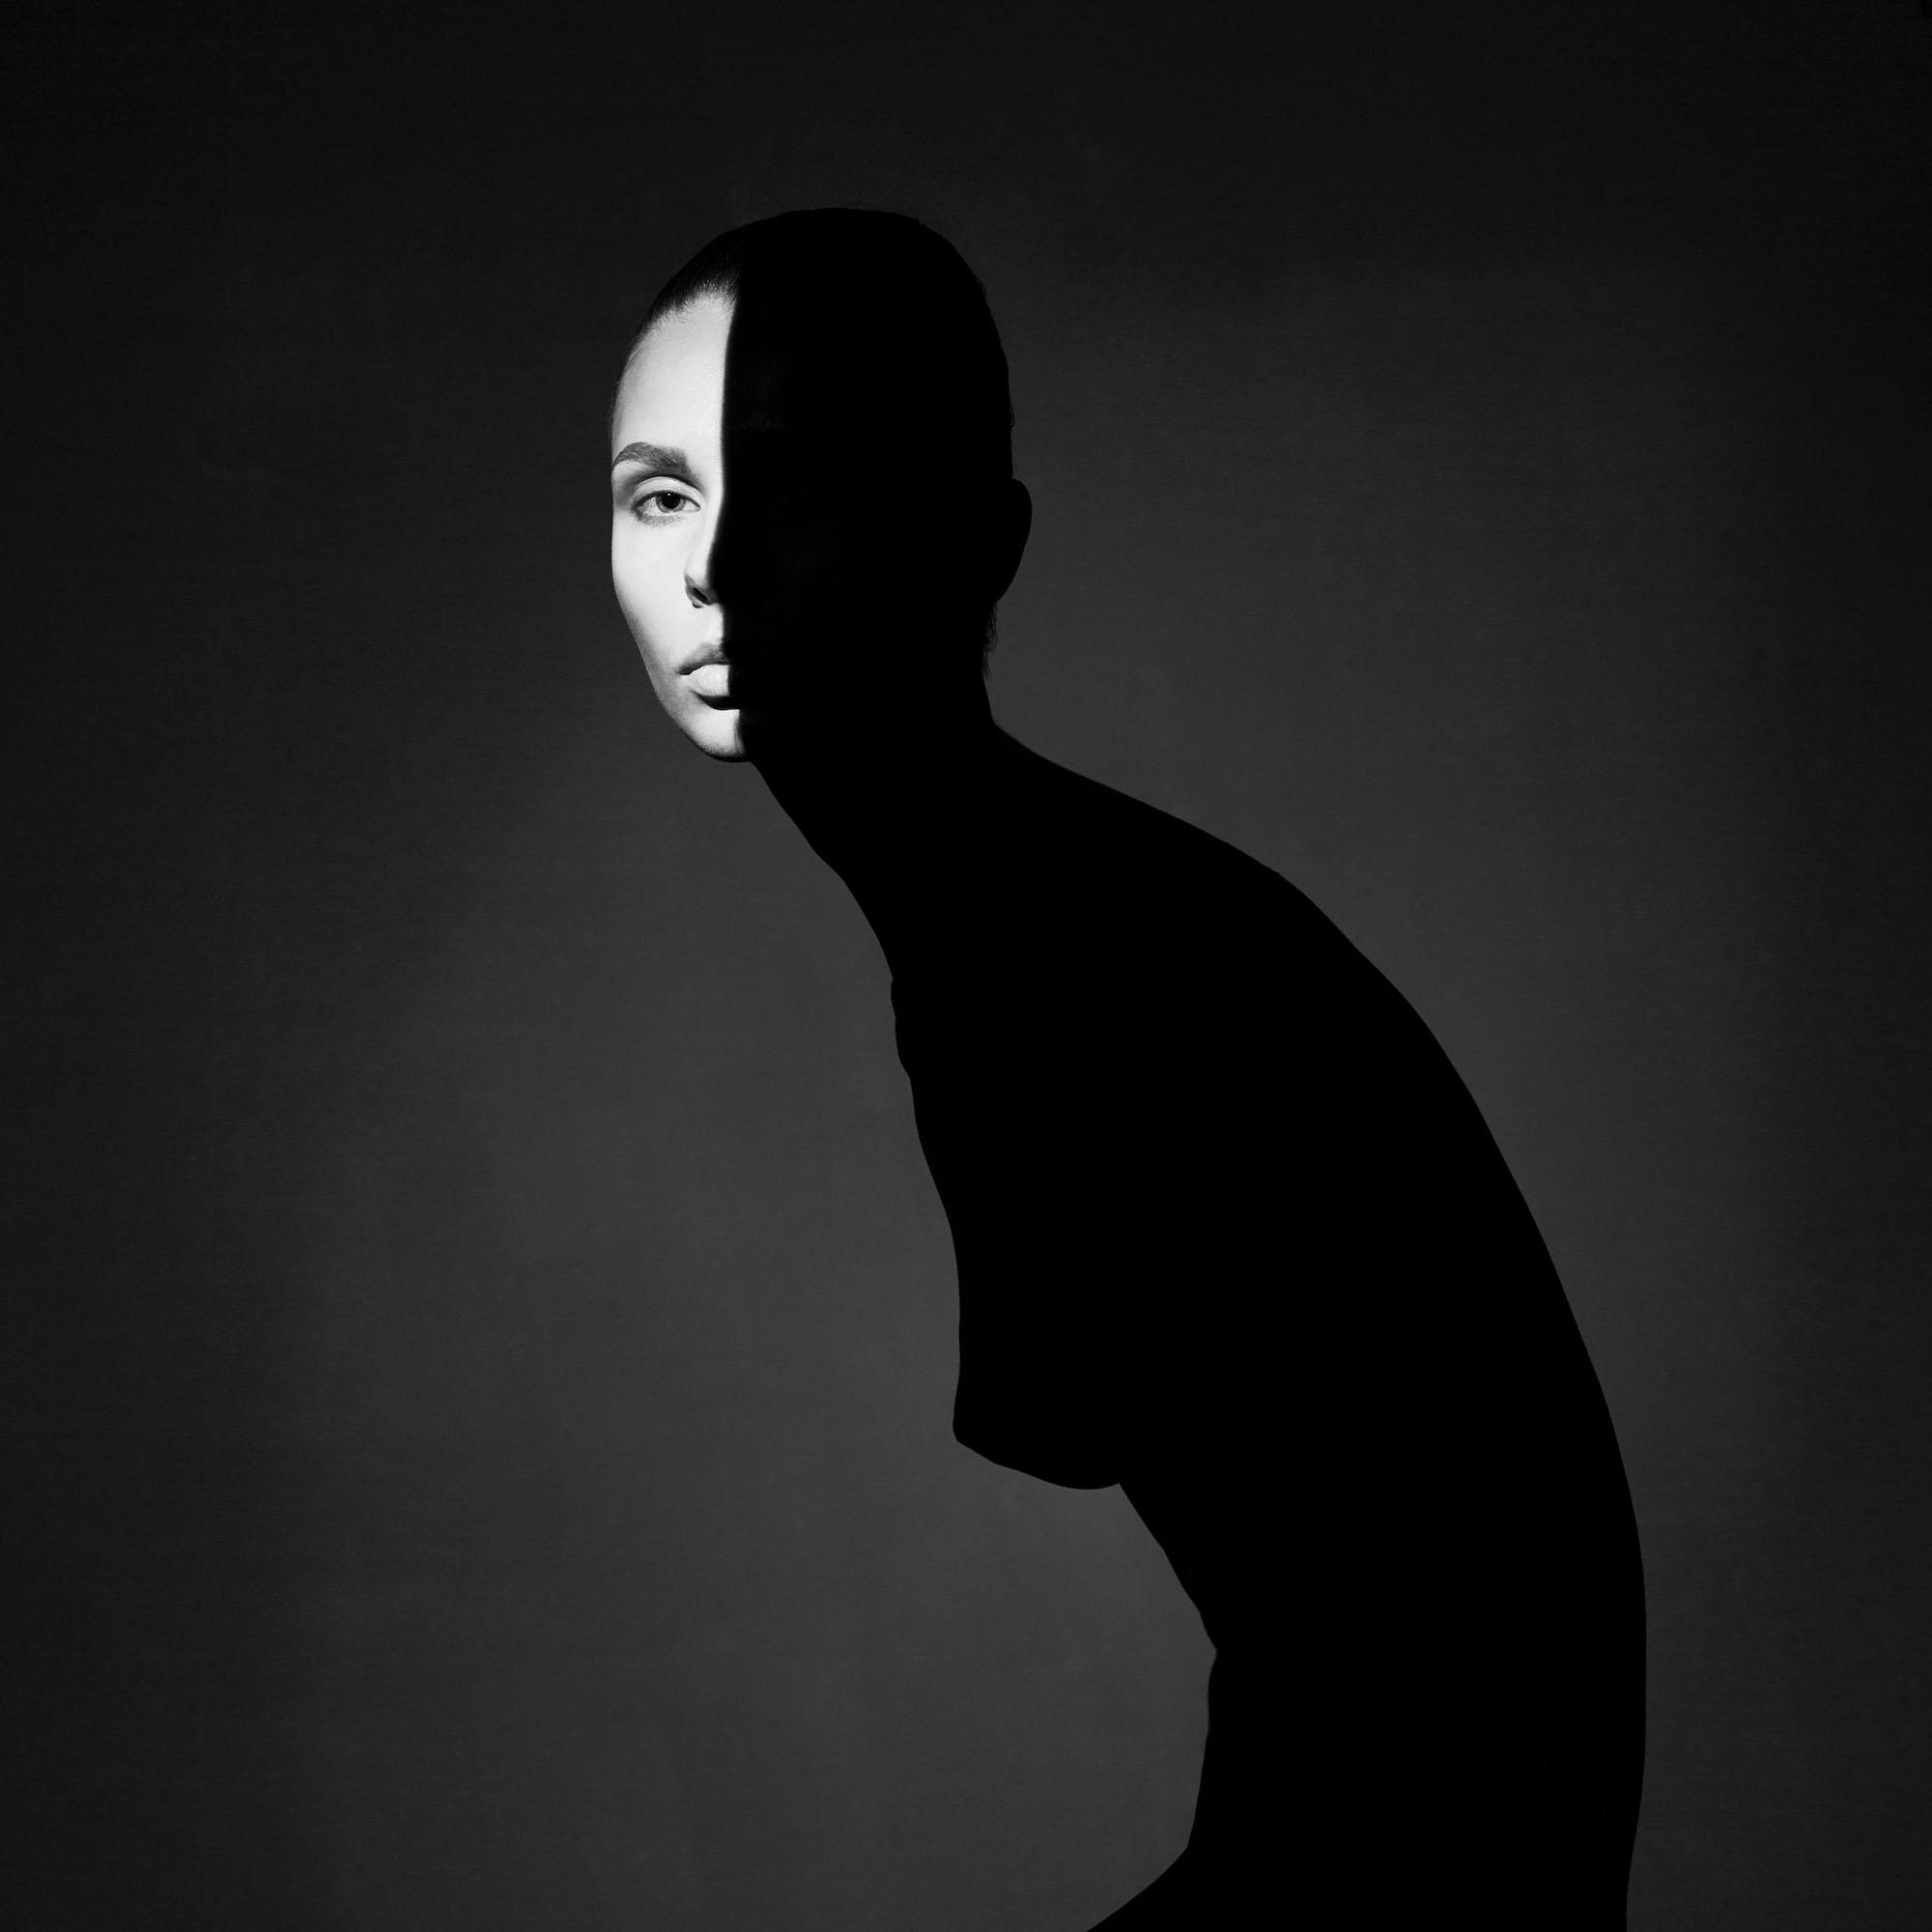 66109_84439_1_ © George Mayer, Russia, Shortlist, Professional, Portraiture, 2017 Sony World Photography Awards.jpg